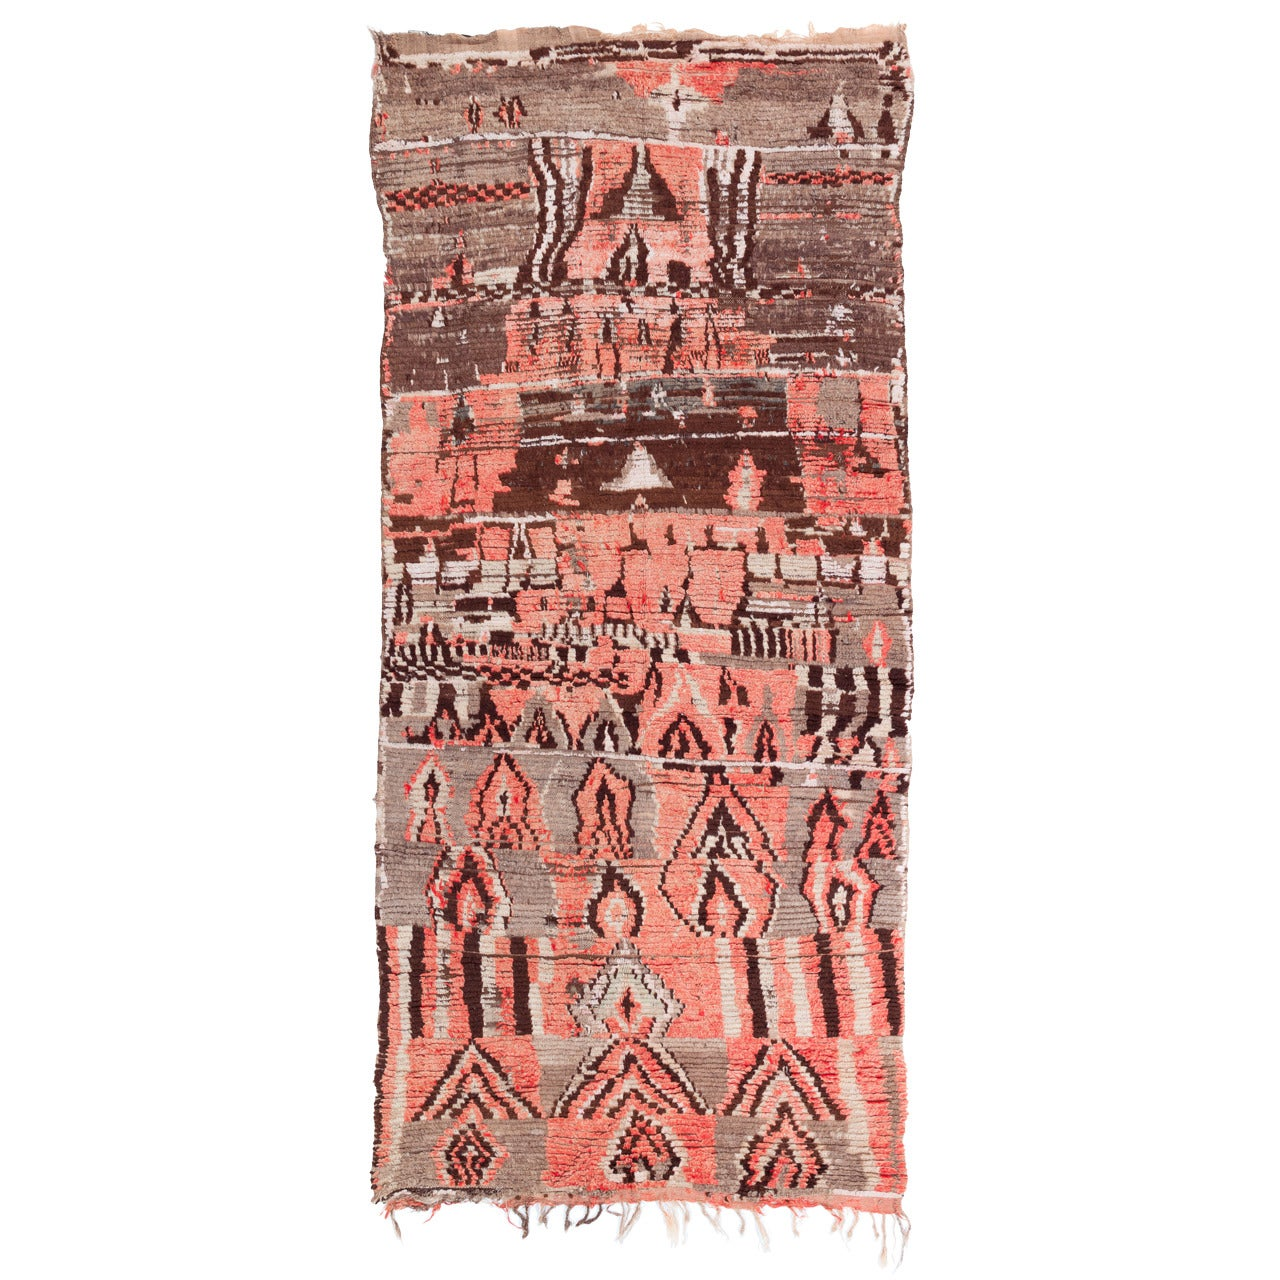 Distinct Pink Vintage Moroccan Berber Rug